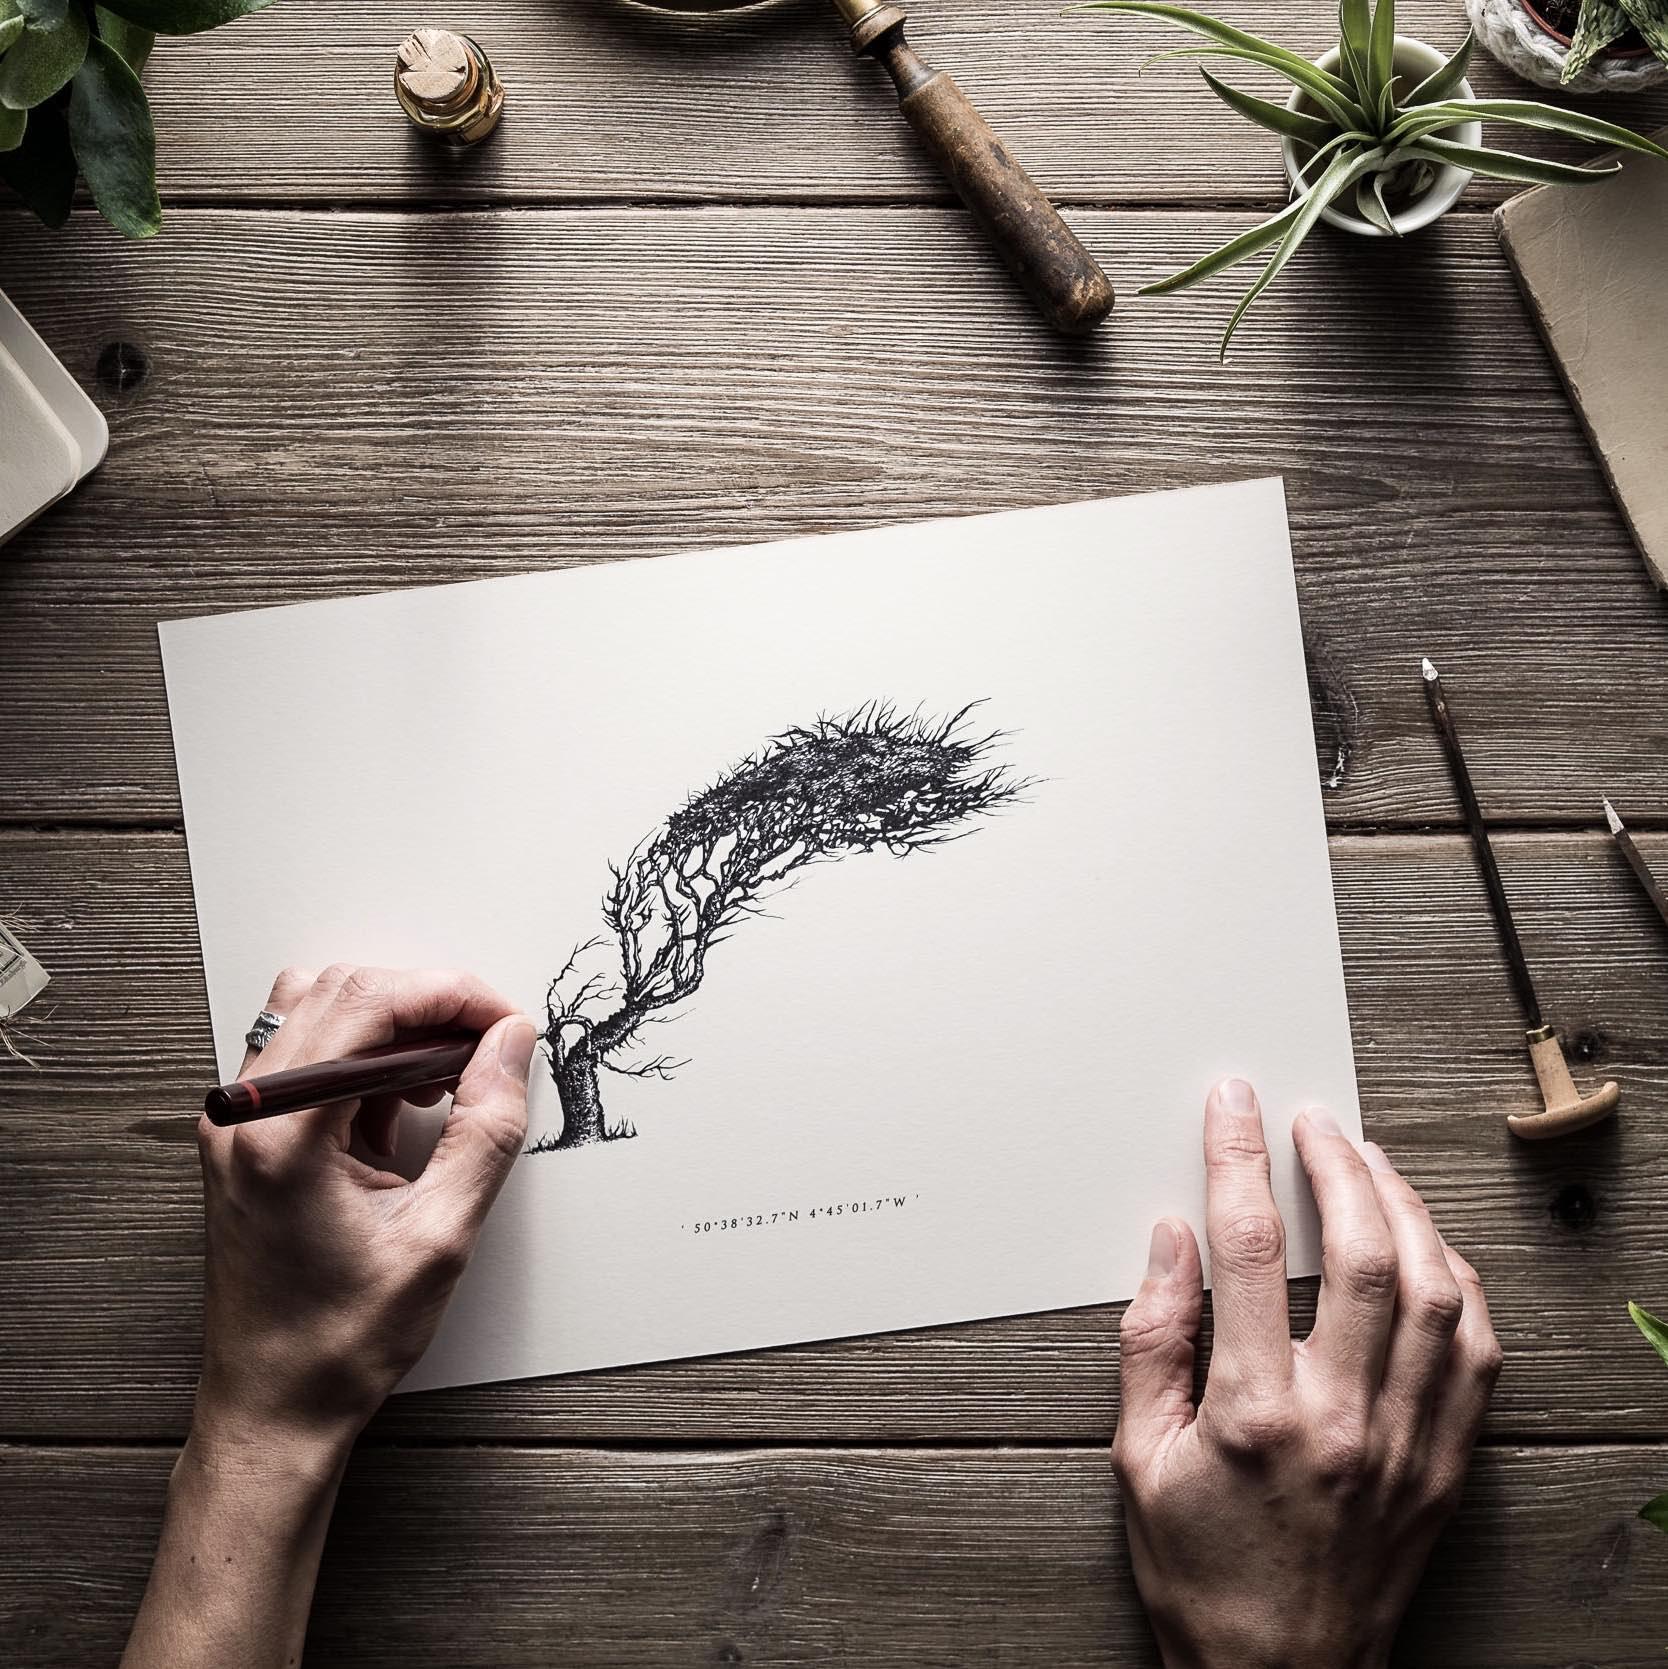 Wind Pruned Tree | Trebarwith | Being drawn